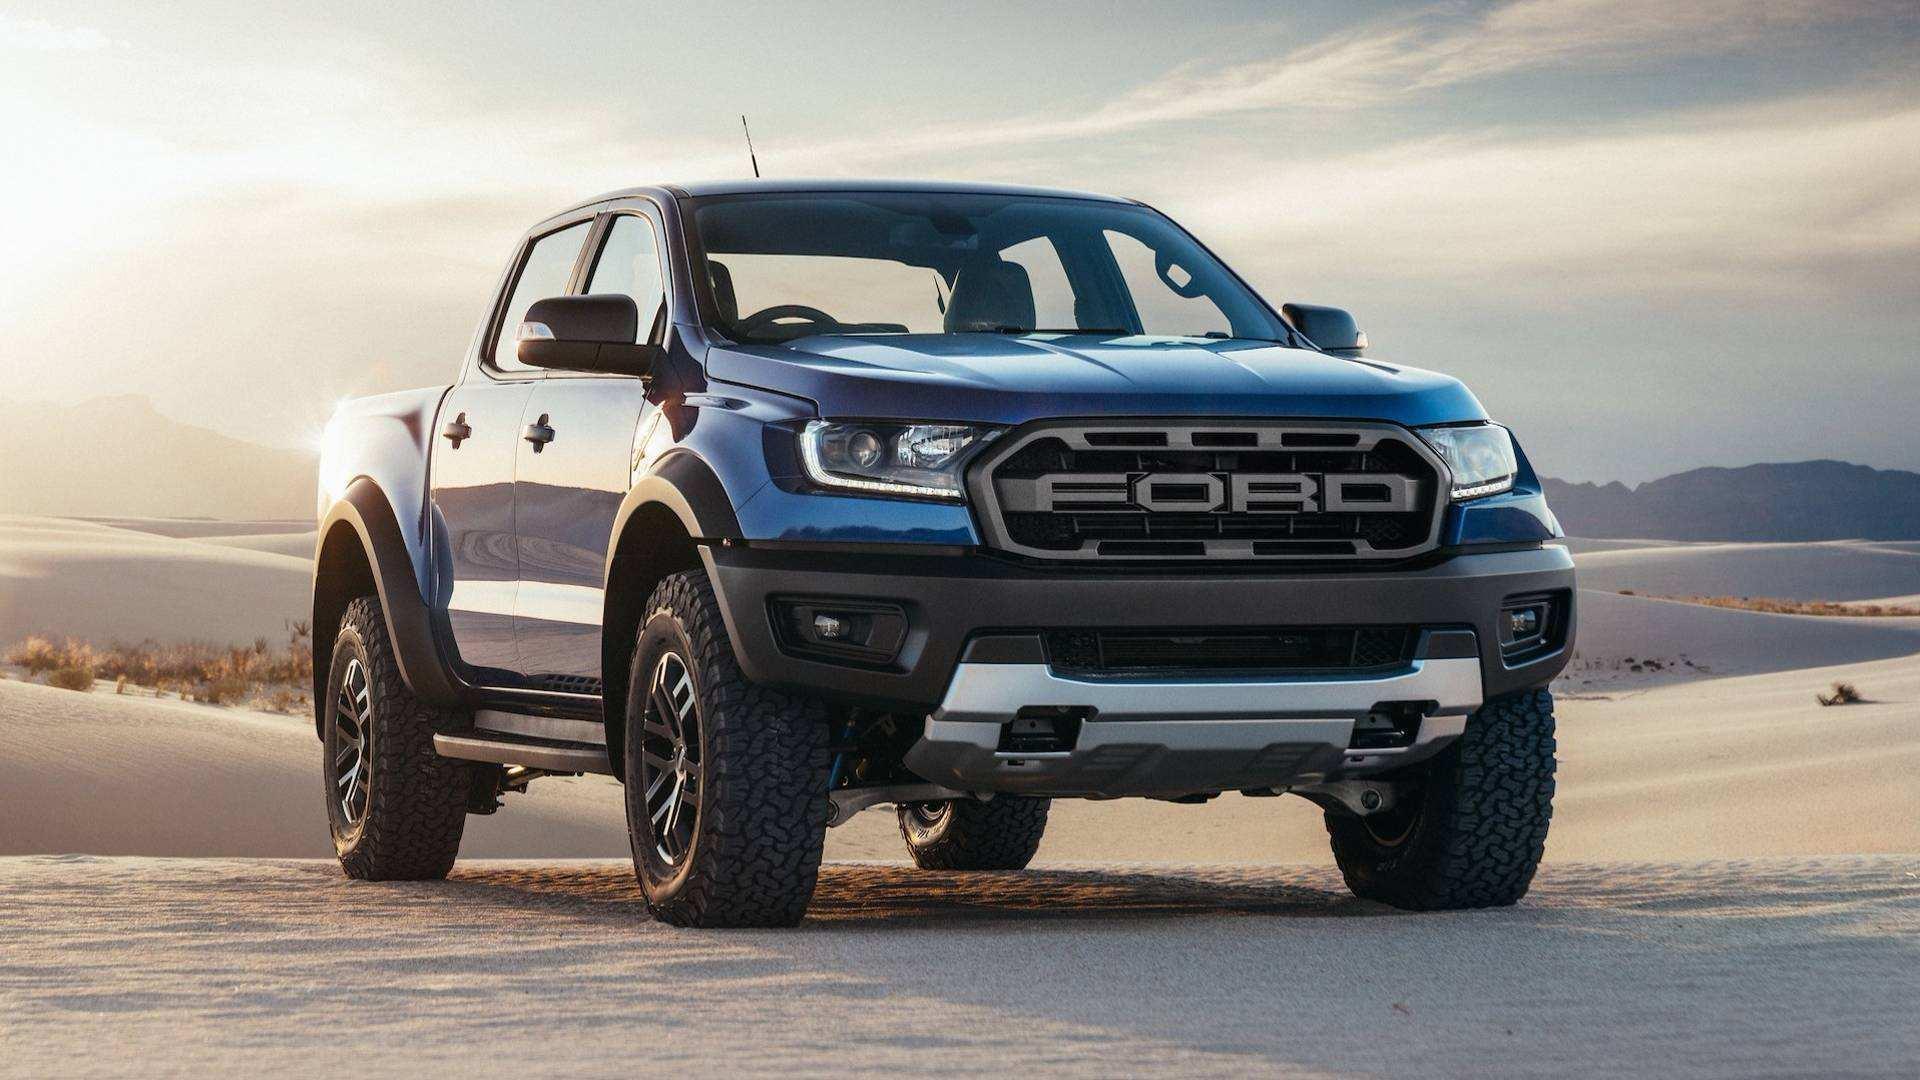 95 Great 2019 Ford Ranger Raptor Engine for 2019 Ford Ranger Raptor